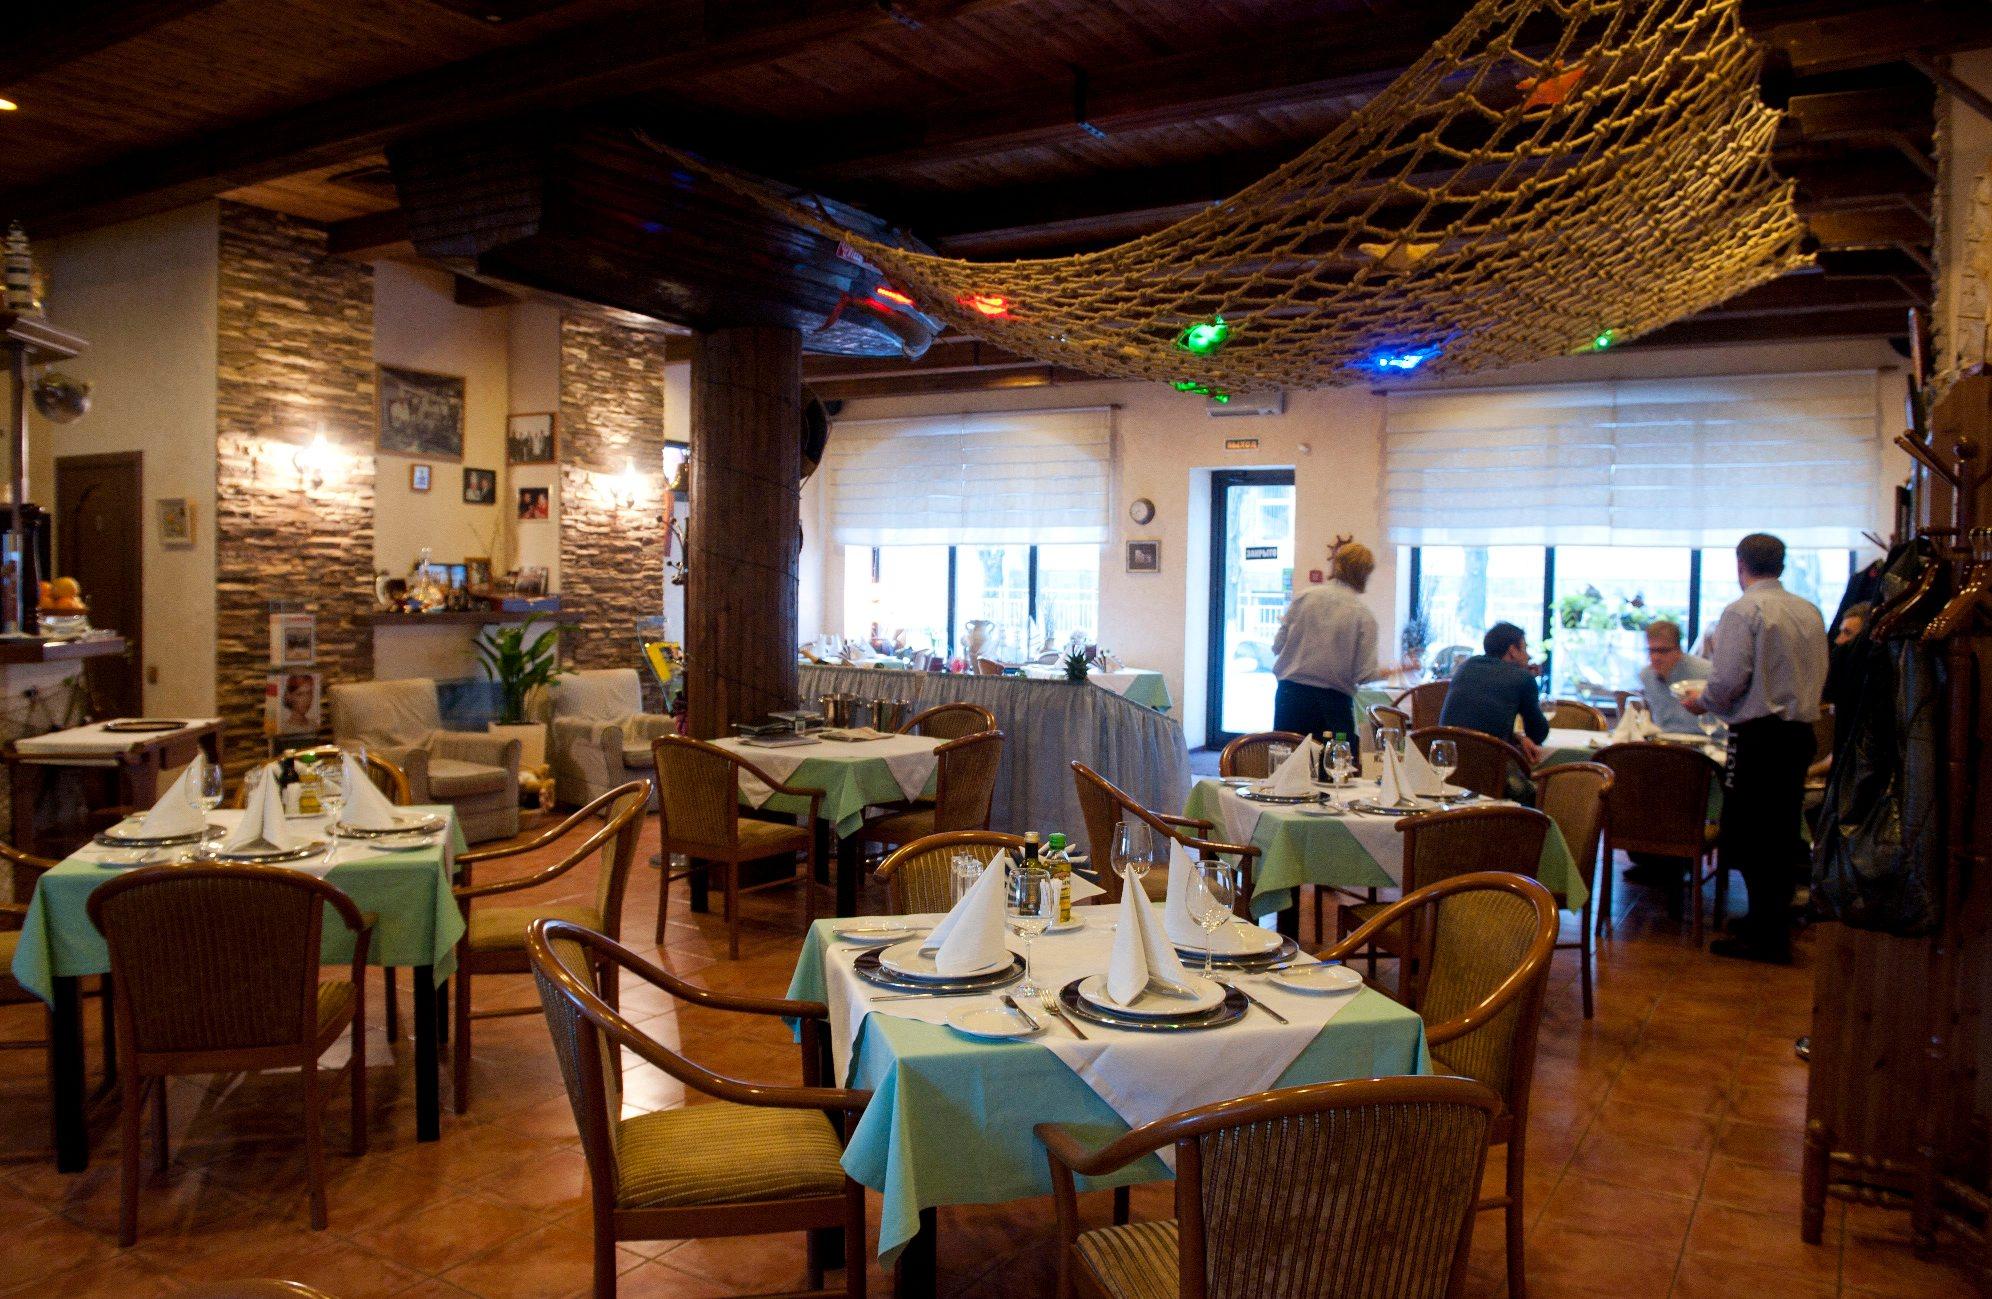 Riblji restoran u Rusiji